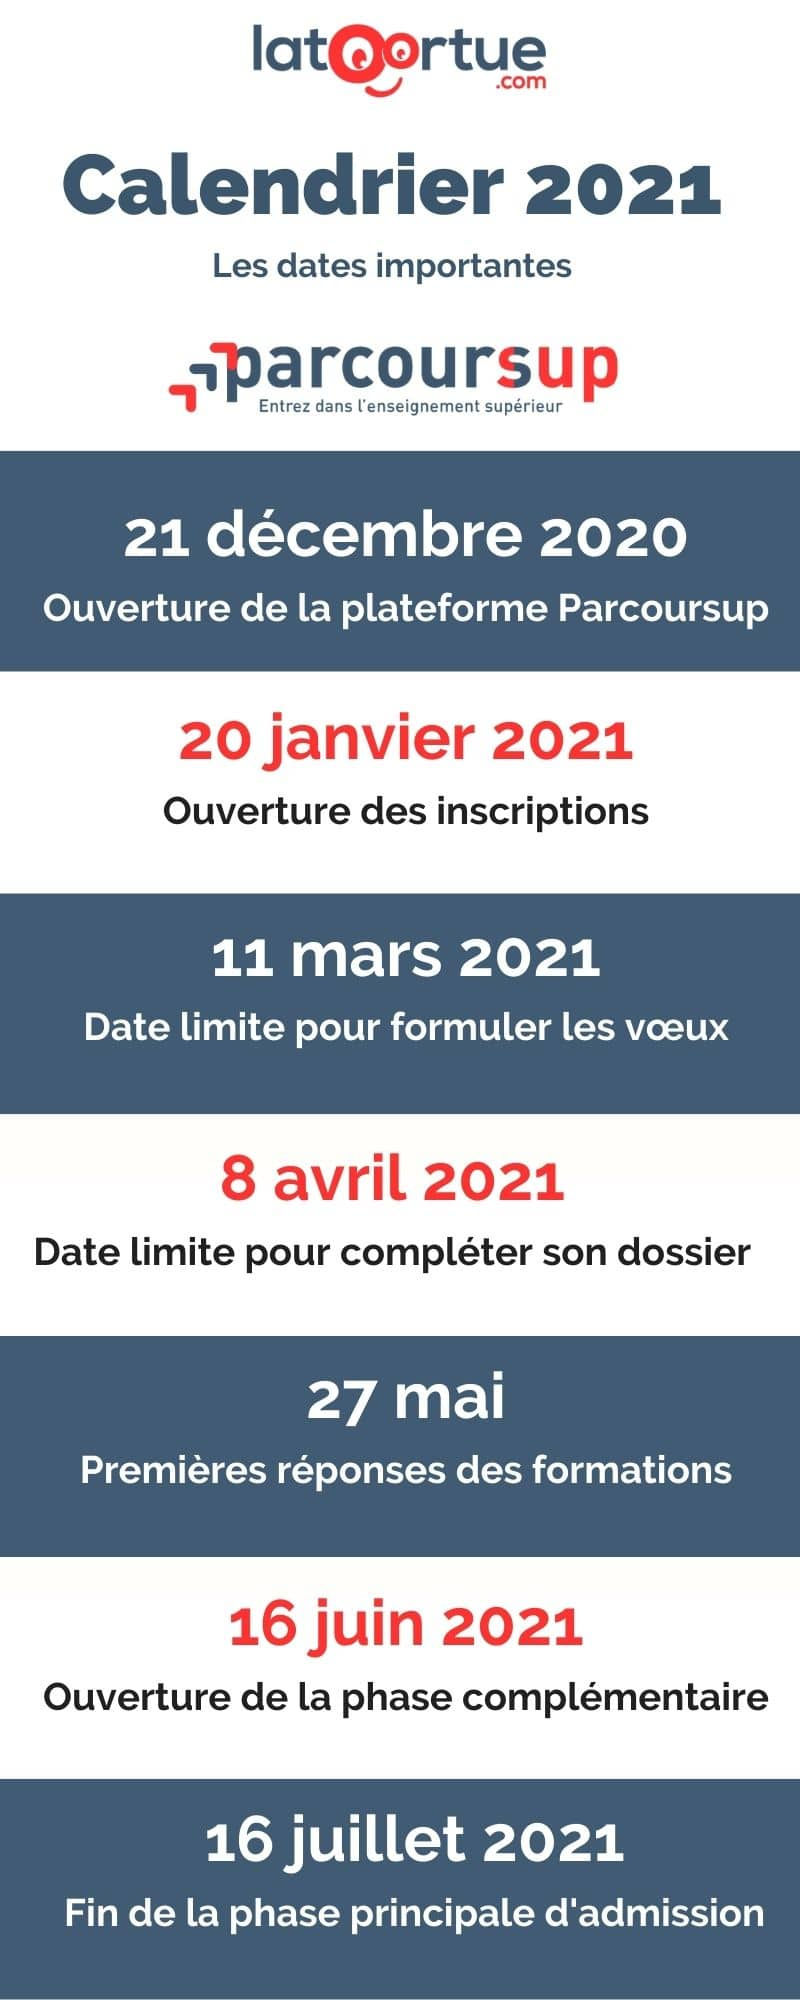 Calendrier Parcoursup 2021